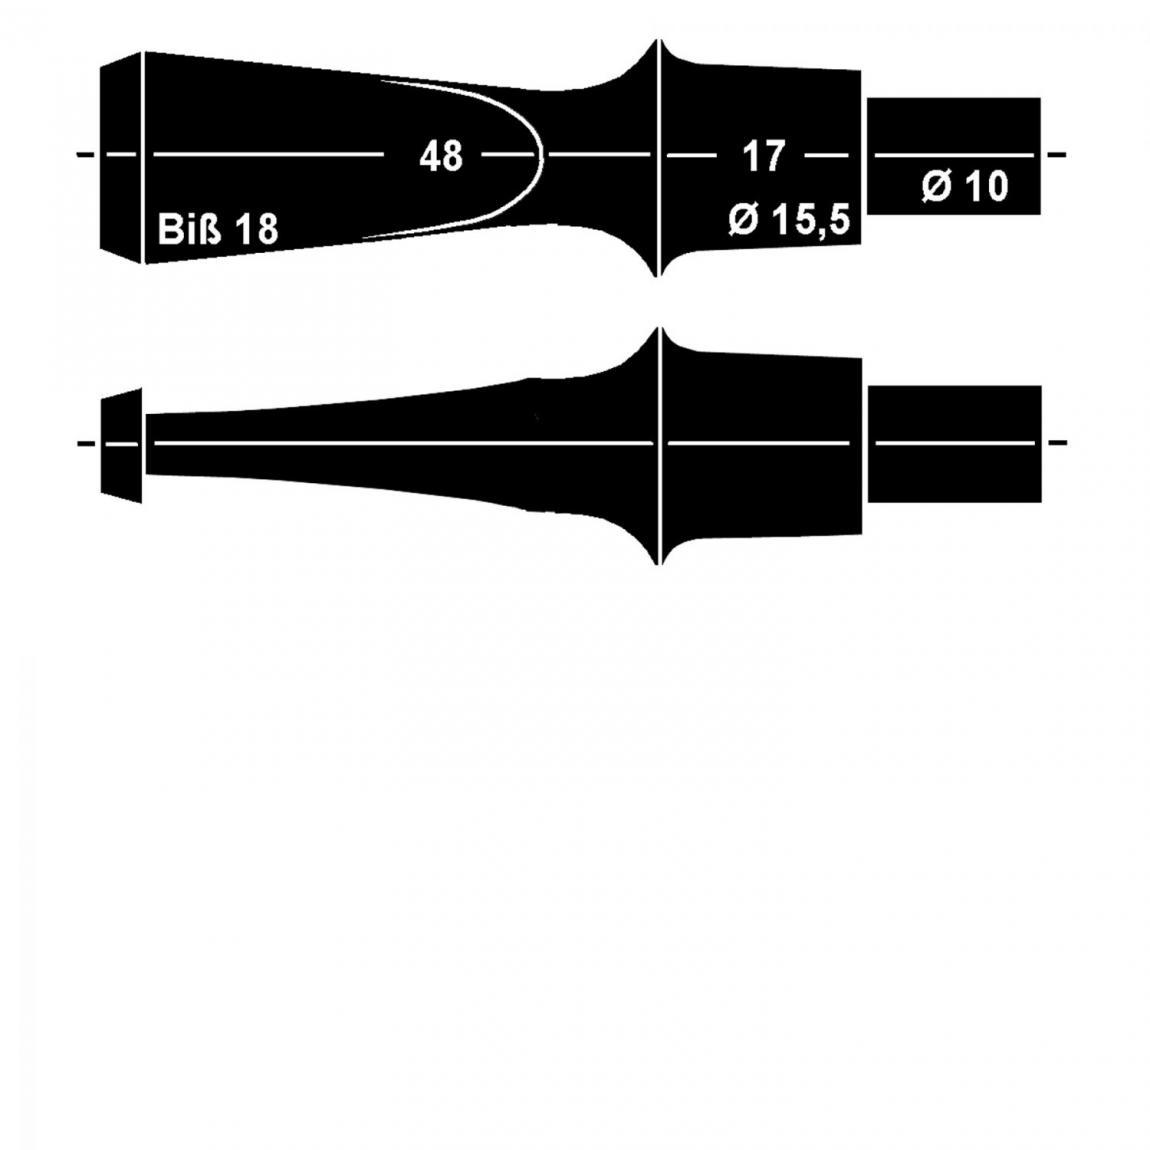 Mundstück aus Ebonit Nr. 37 Fancy, vorgedreht ohne Filter